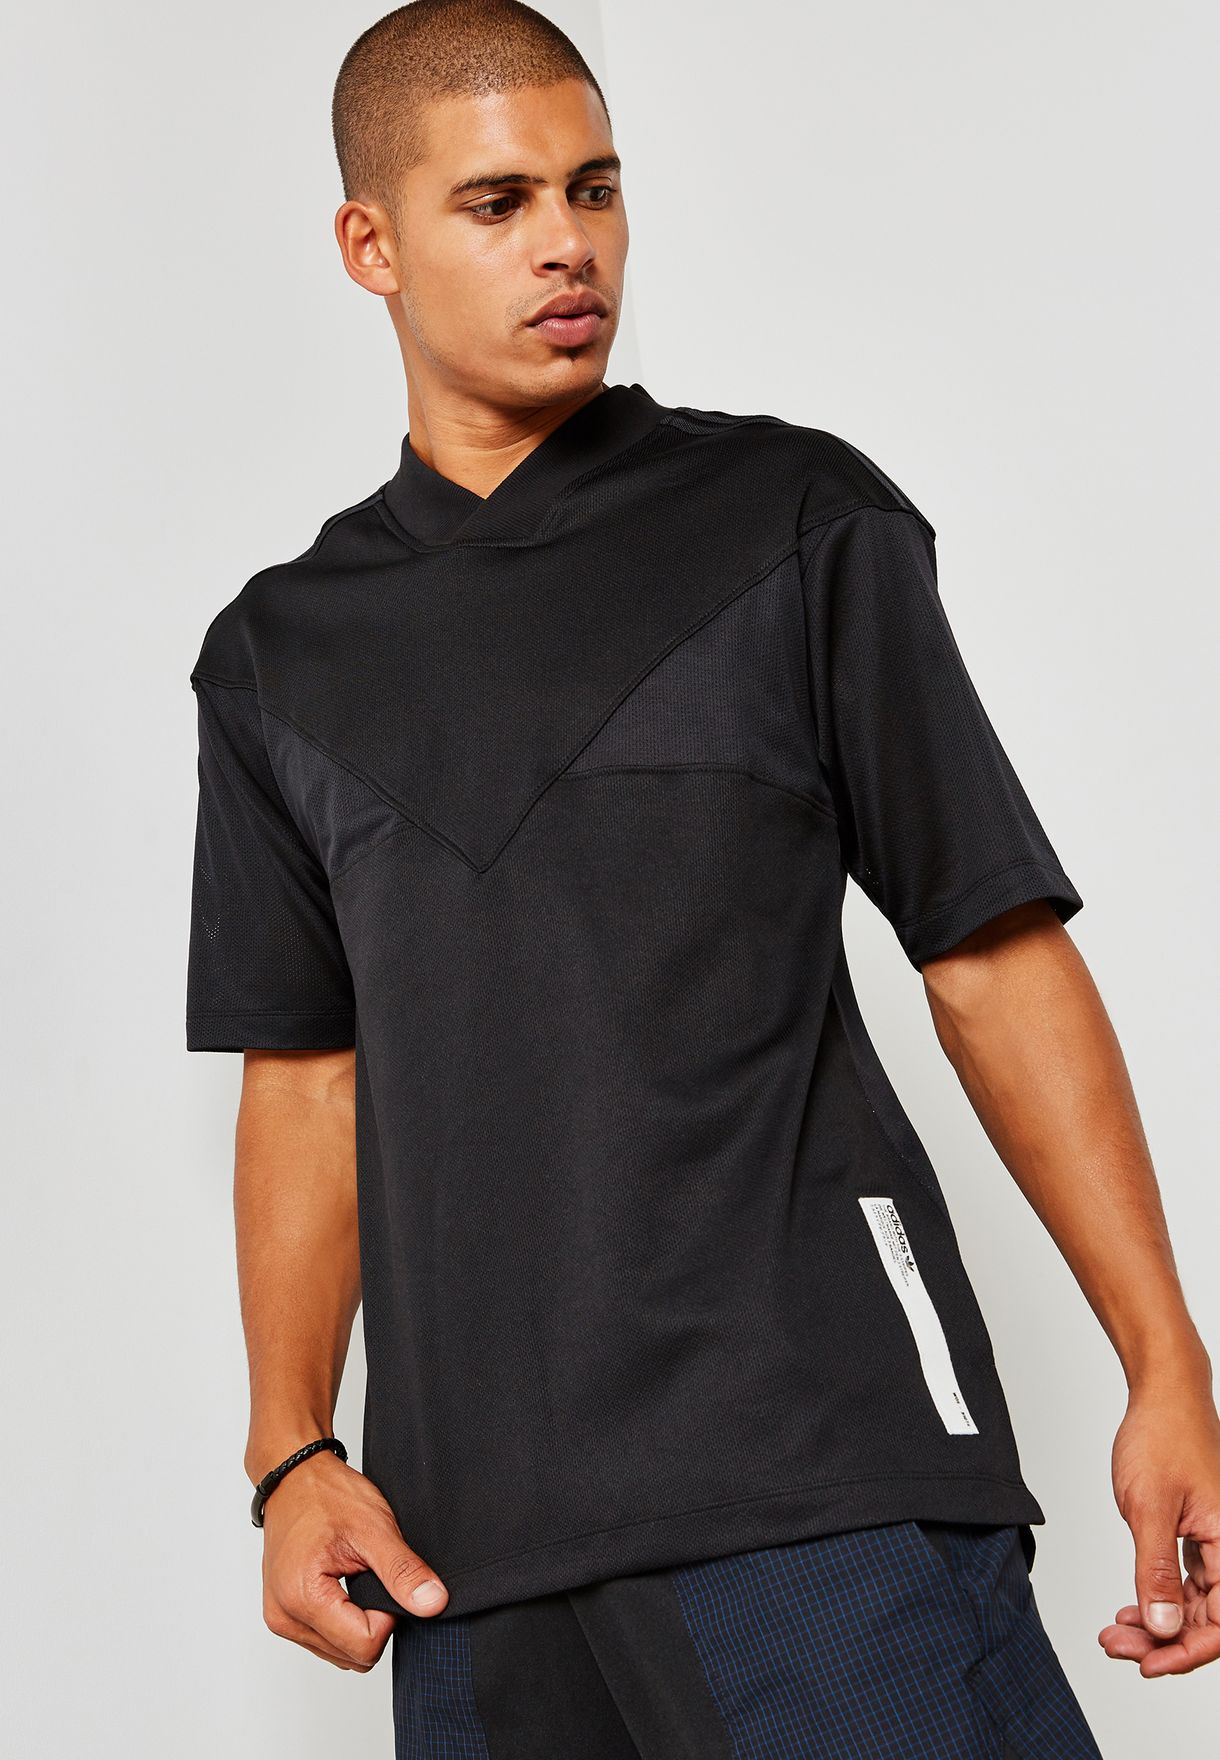 c1642dfd5912 Shop adidas Originals black NMD T-Shirt DH2271 for Men in UAE ...